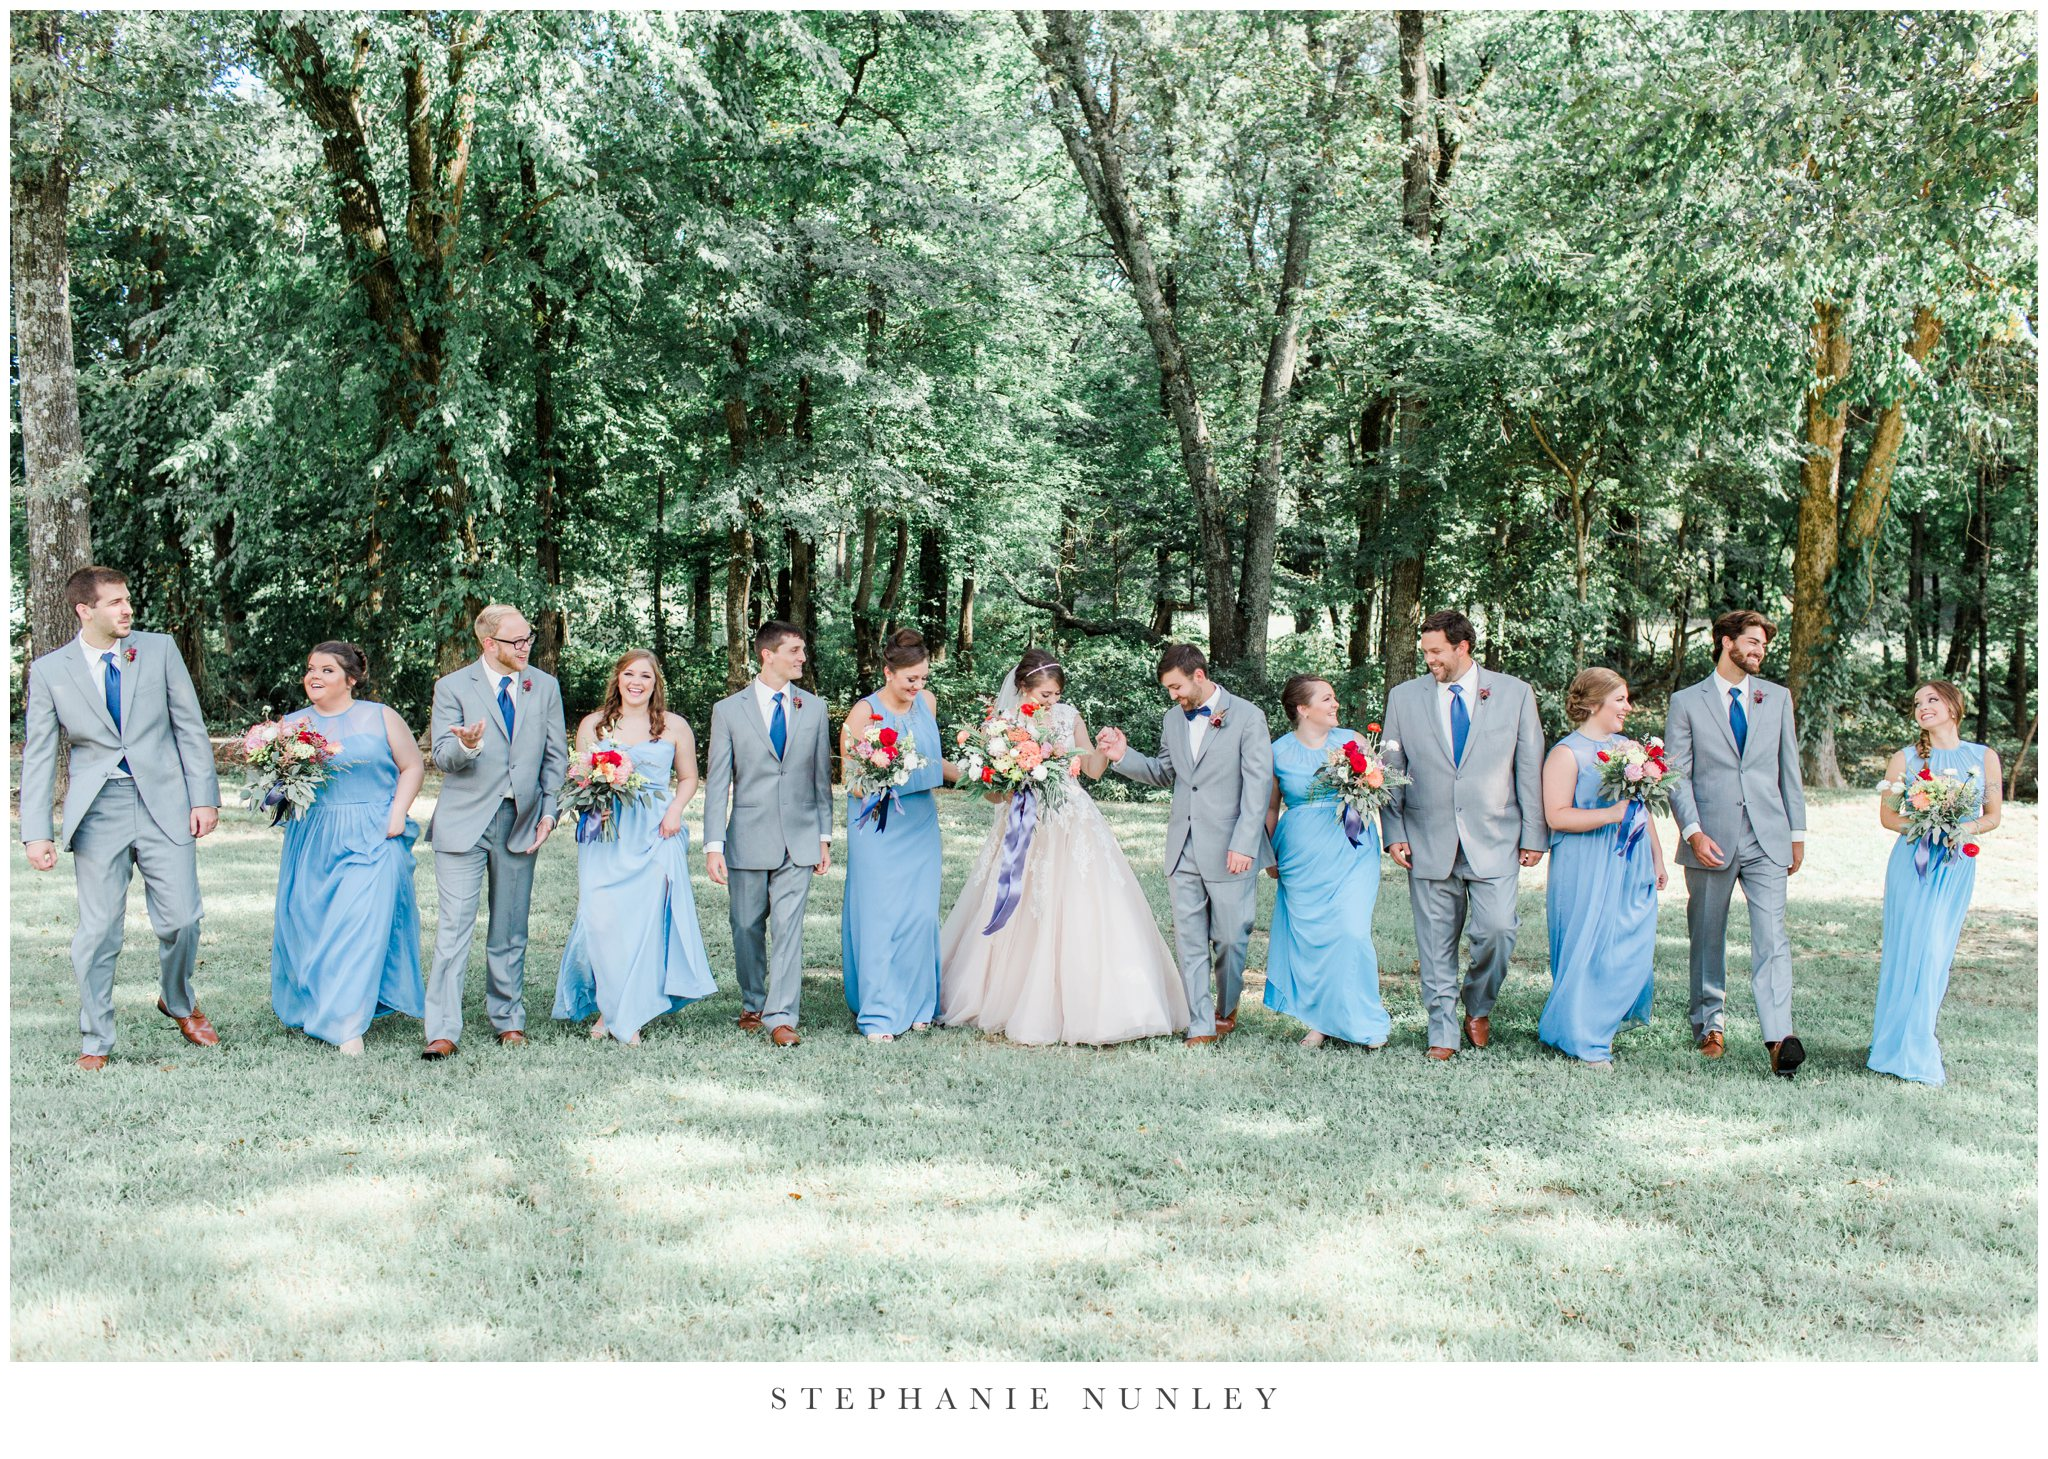 arkansas-wedding-with-lush-wildflower-bouquet-0076.jpg